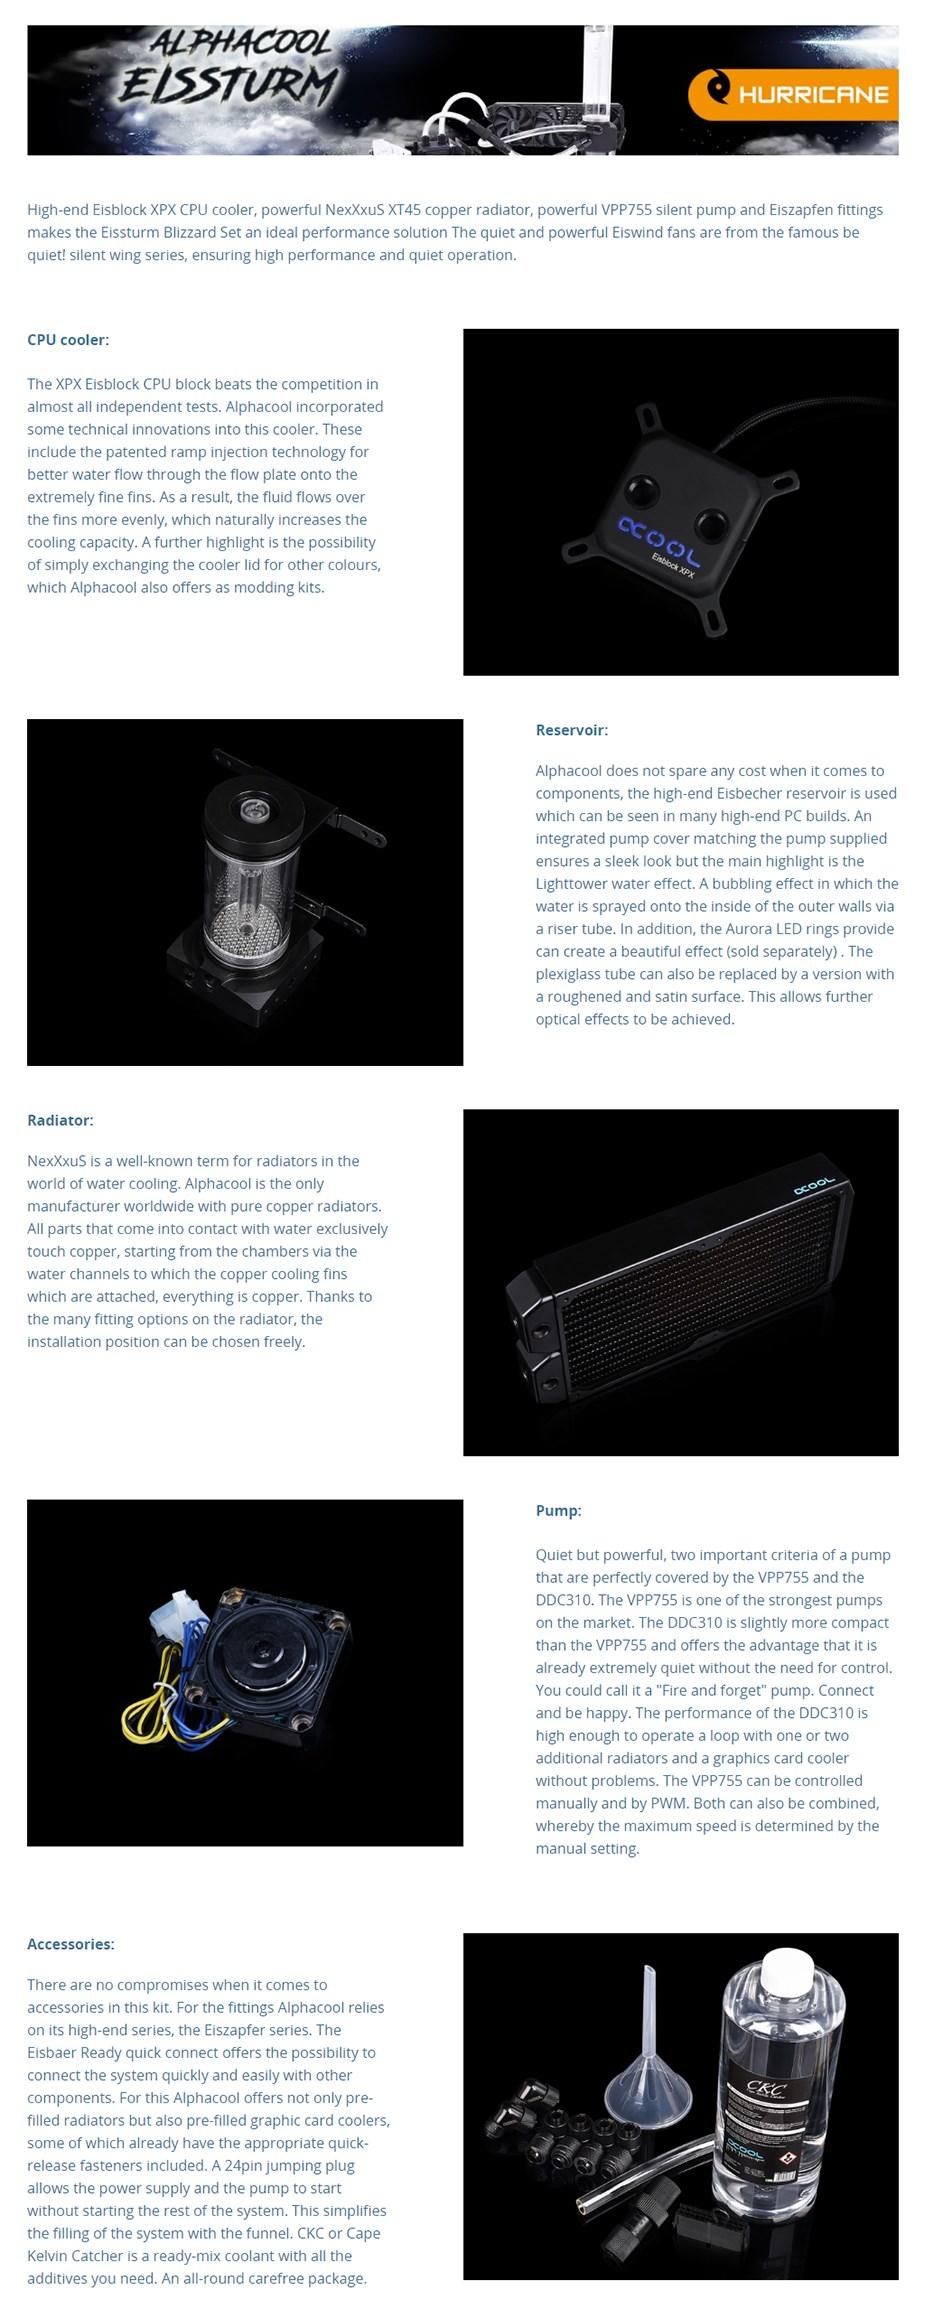 Alphacool Eissturm Hurricane Copper 45 2x140mm Watercooling Kit - Desktop Overview 1